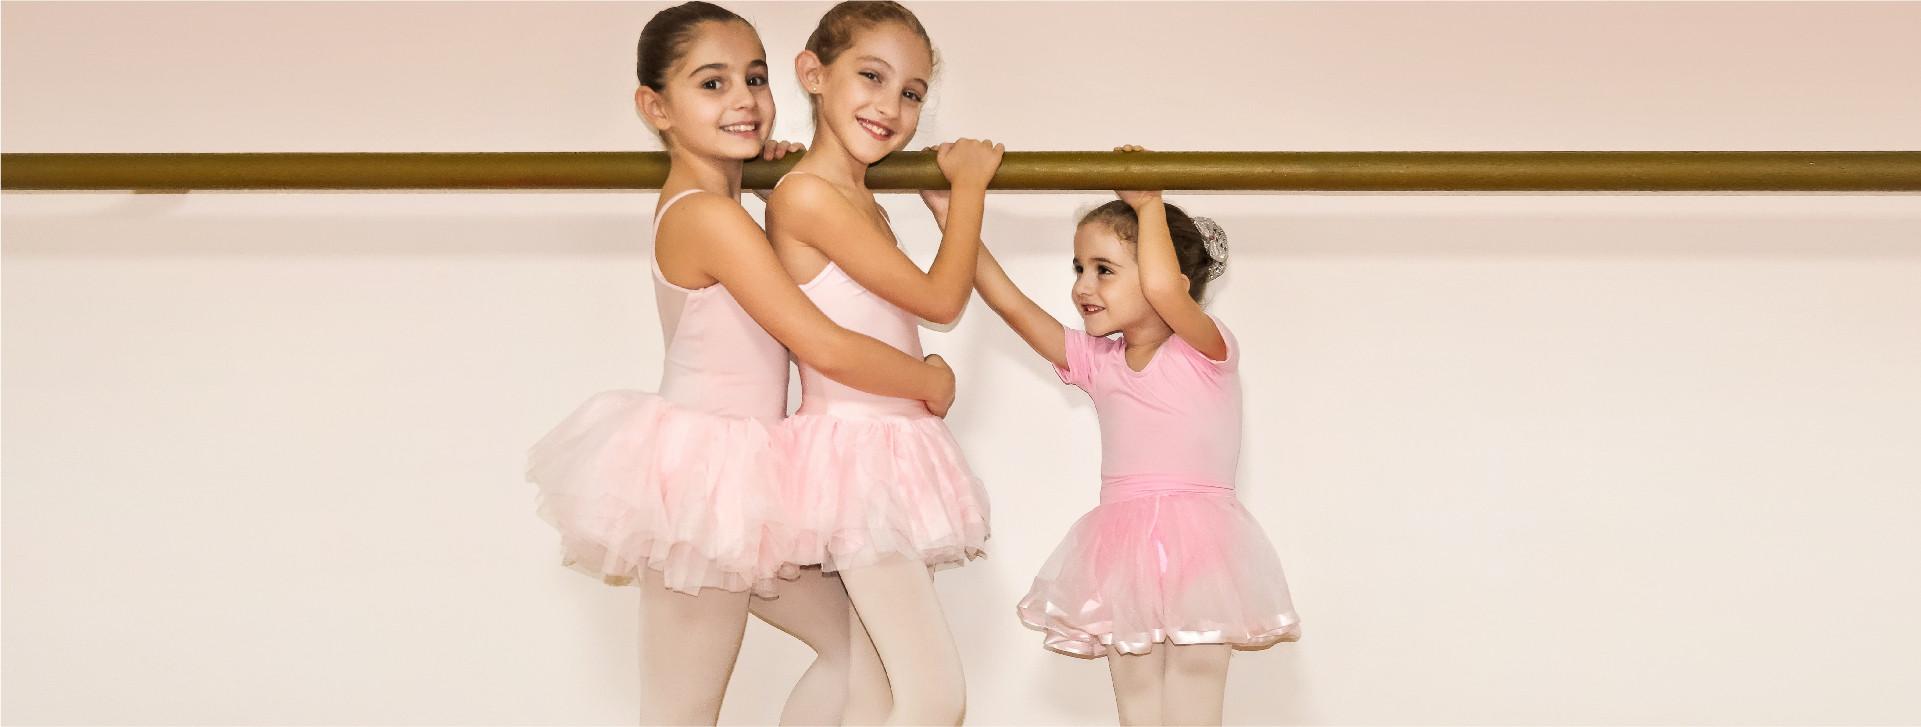 Speciale danza bambina